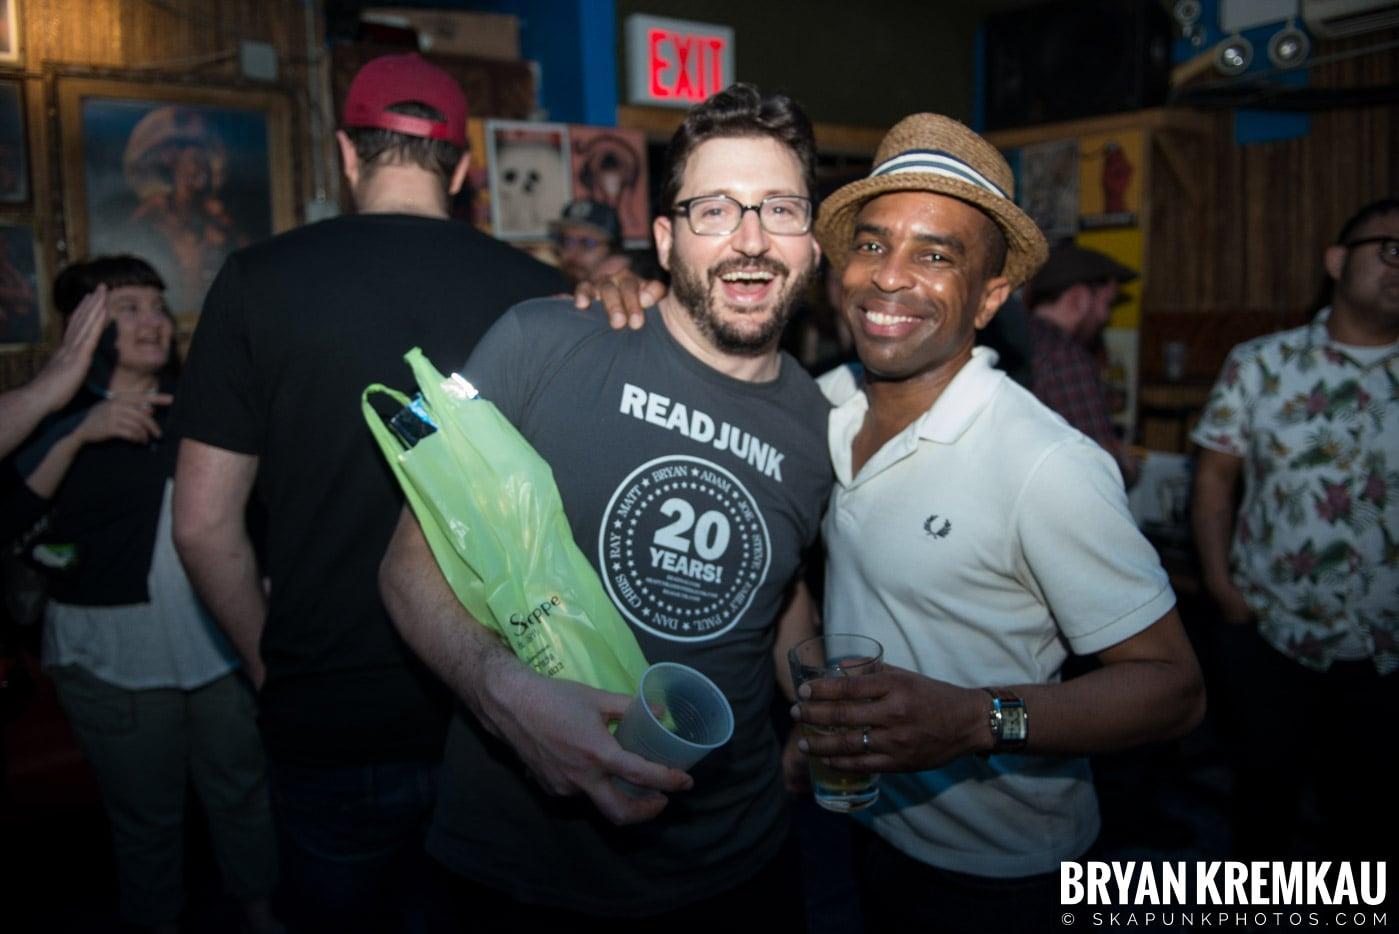 ReadJunk.com 20th Anniversary Party @ Otto's Shrunken Head, NYC - 4.29.17 (34)